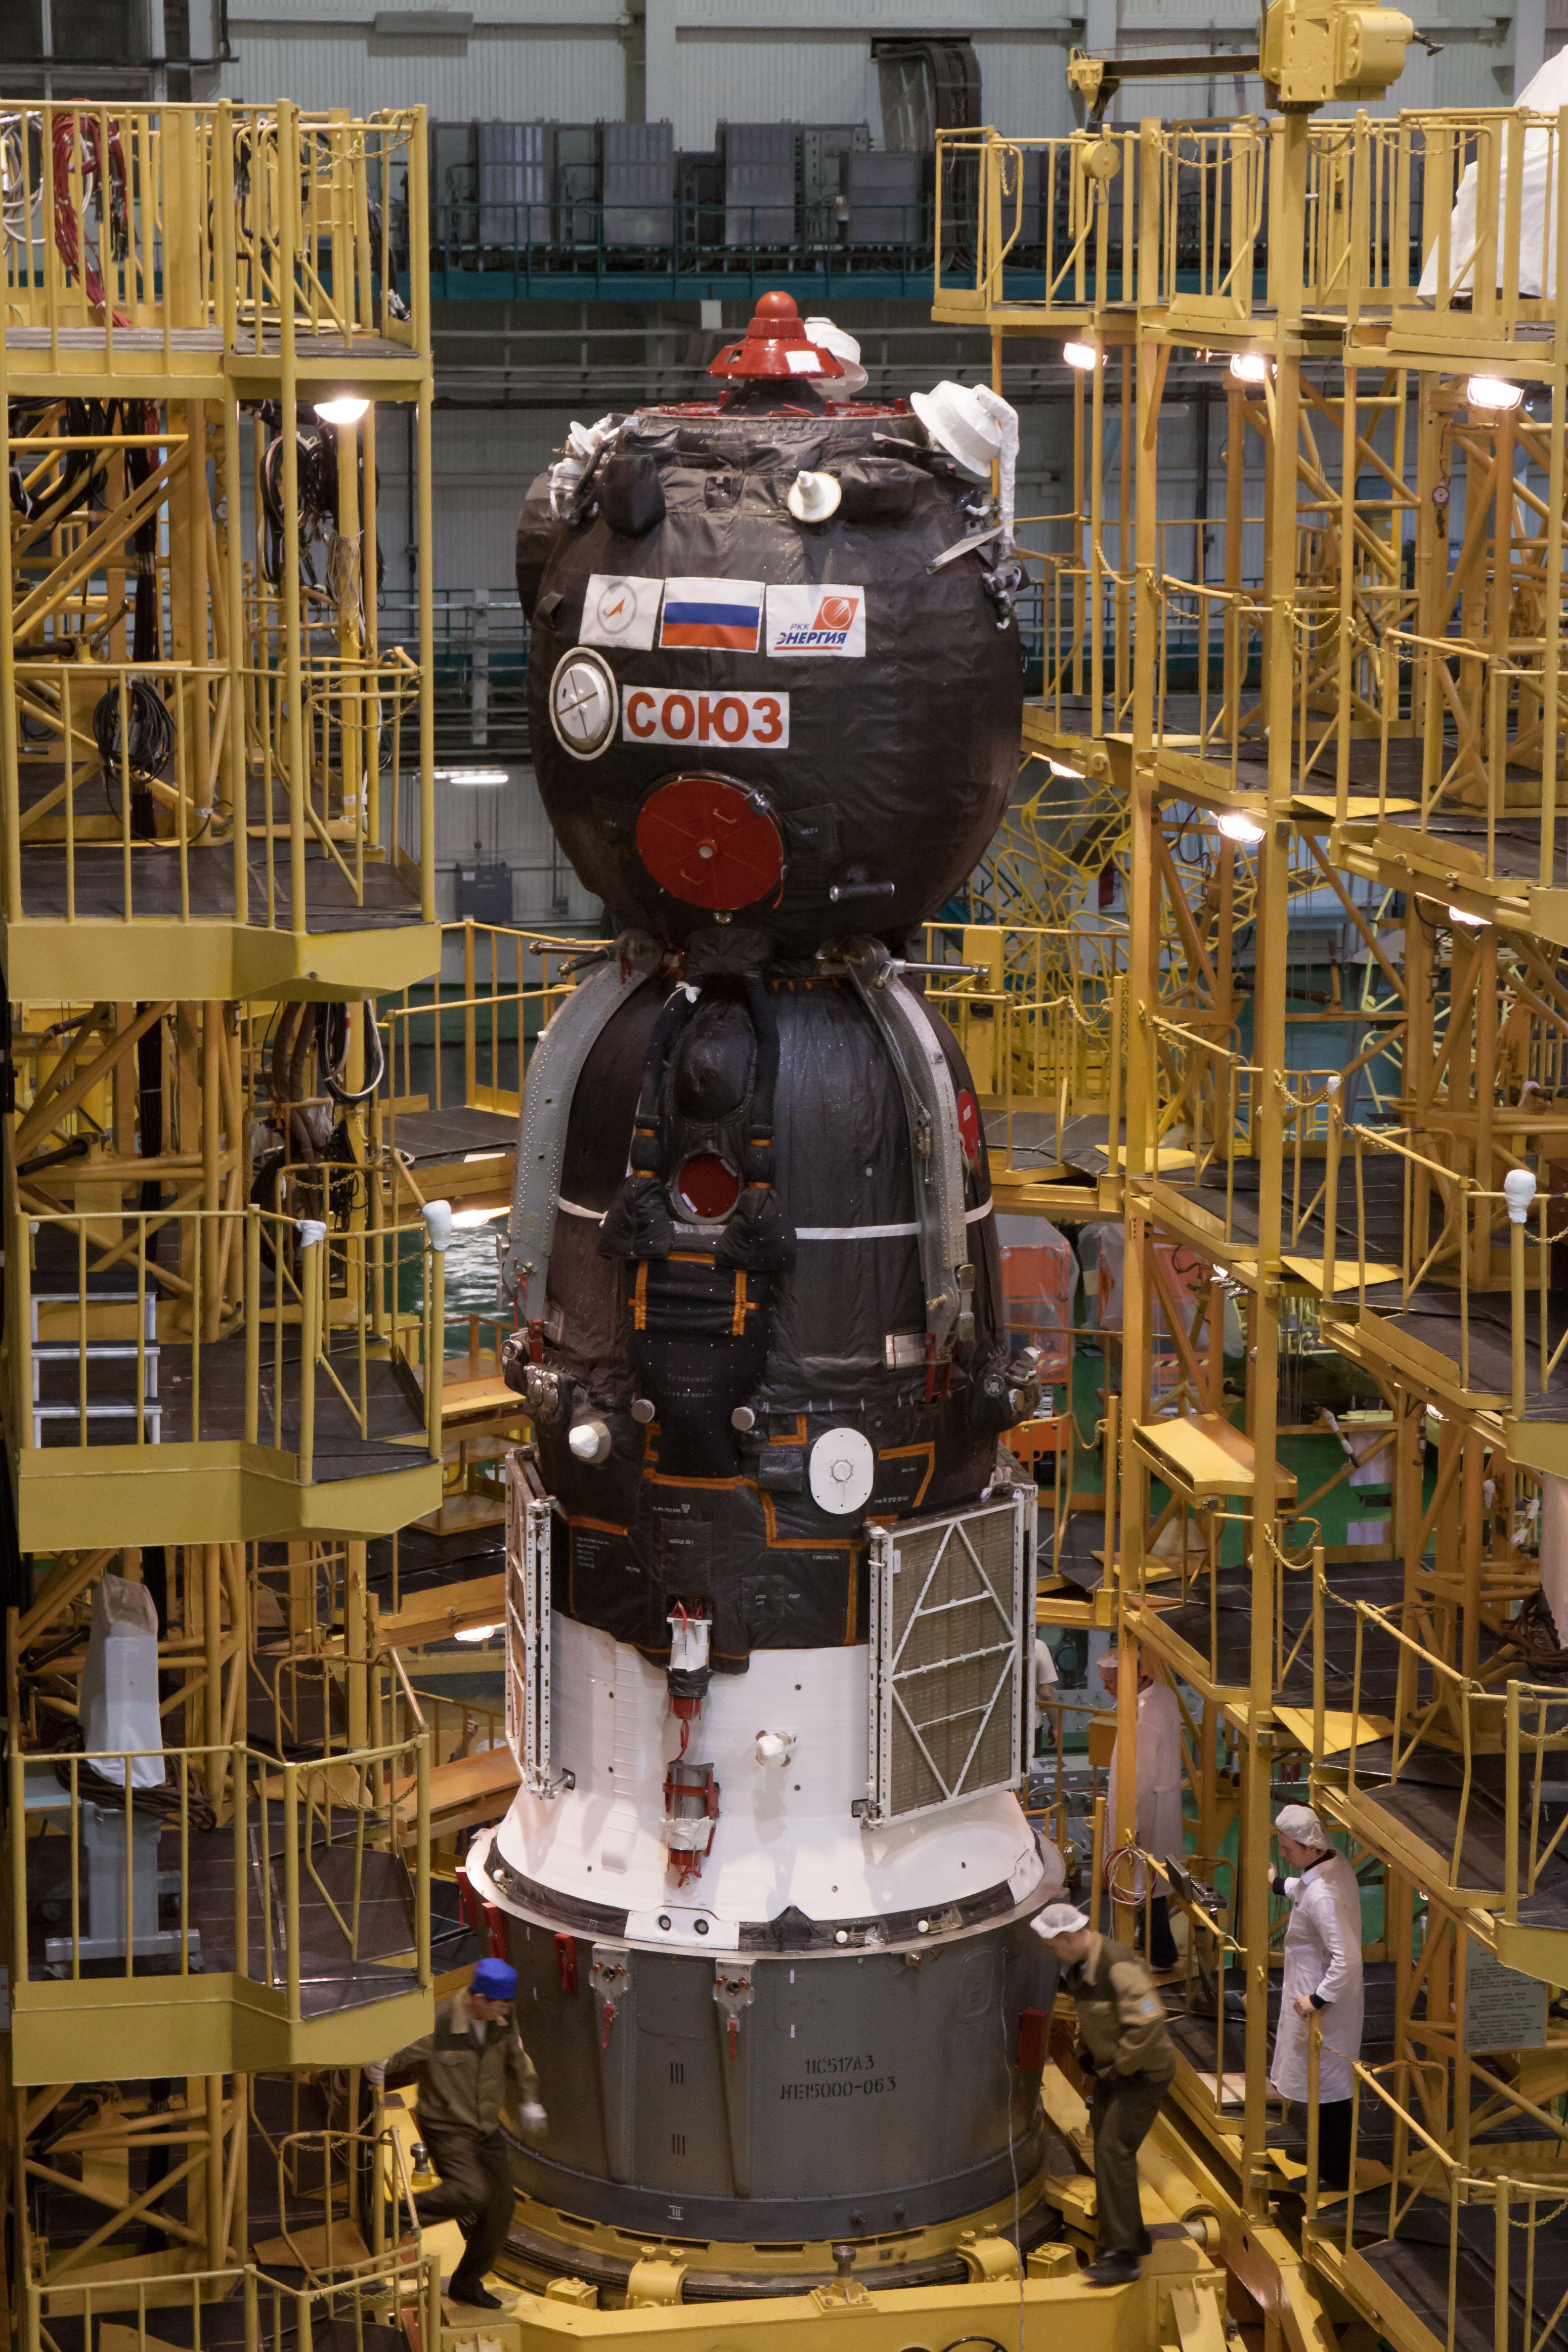 Soyuz_TMA-08M_spacecraft_integration_facility_1.jpg